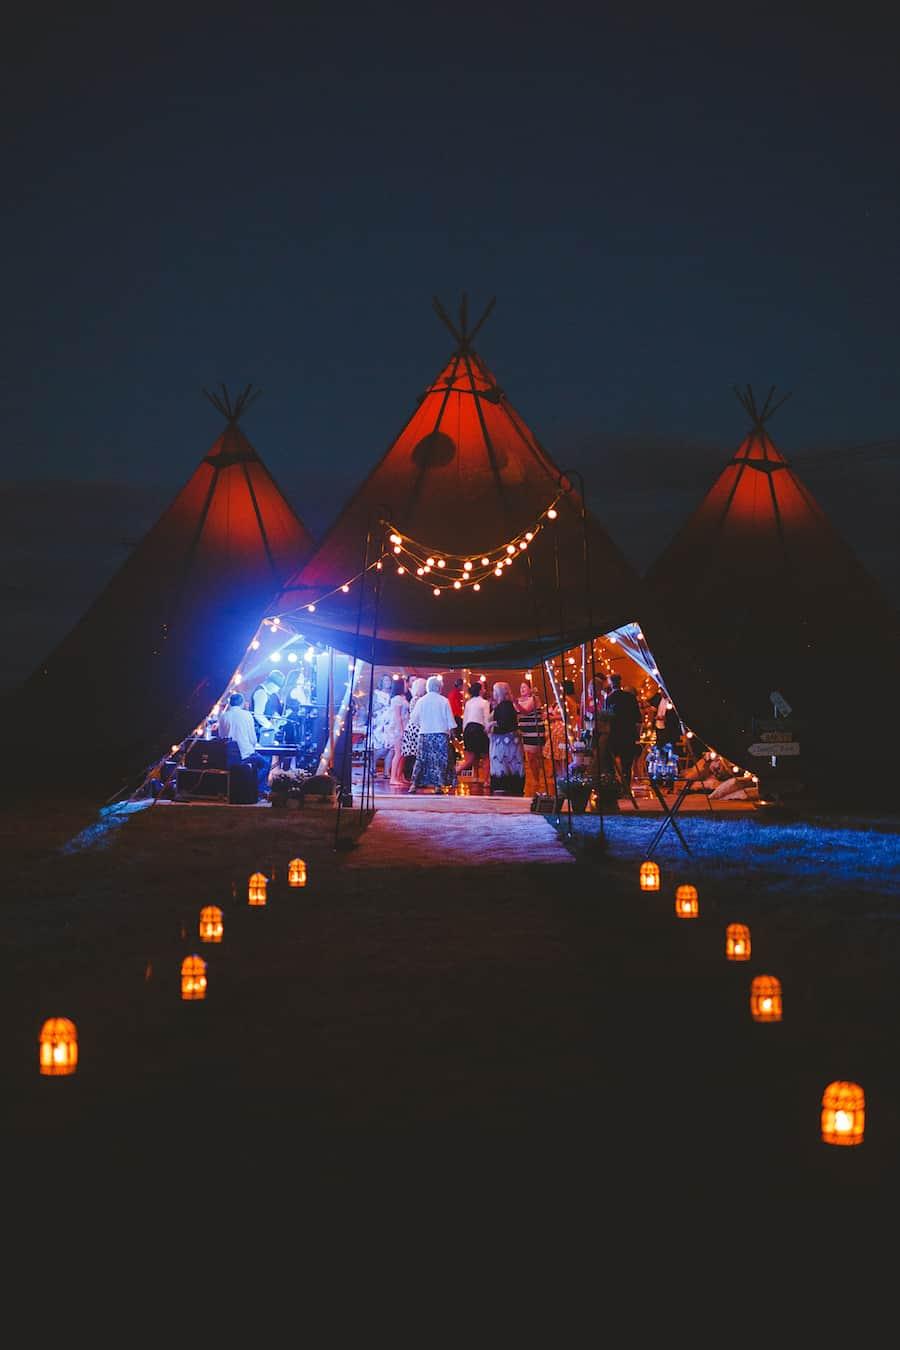 Tipi Walkway at night with lanterns and festoon walkway - Tipis glowing